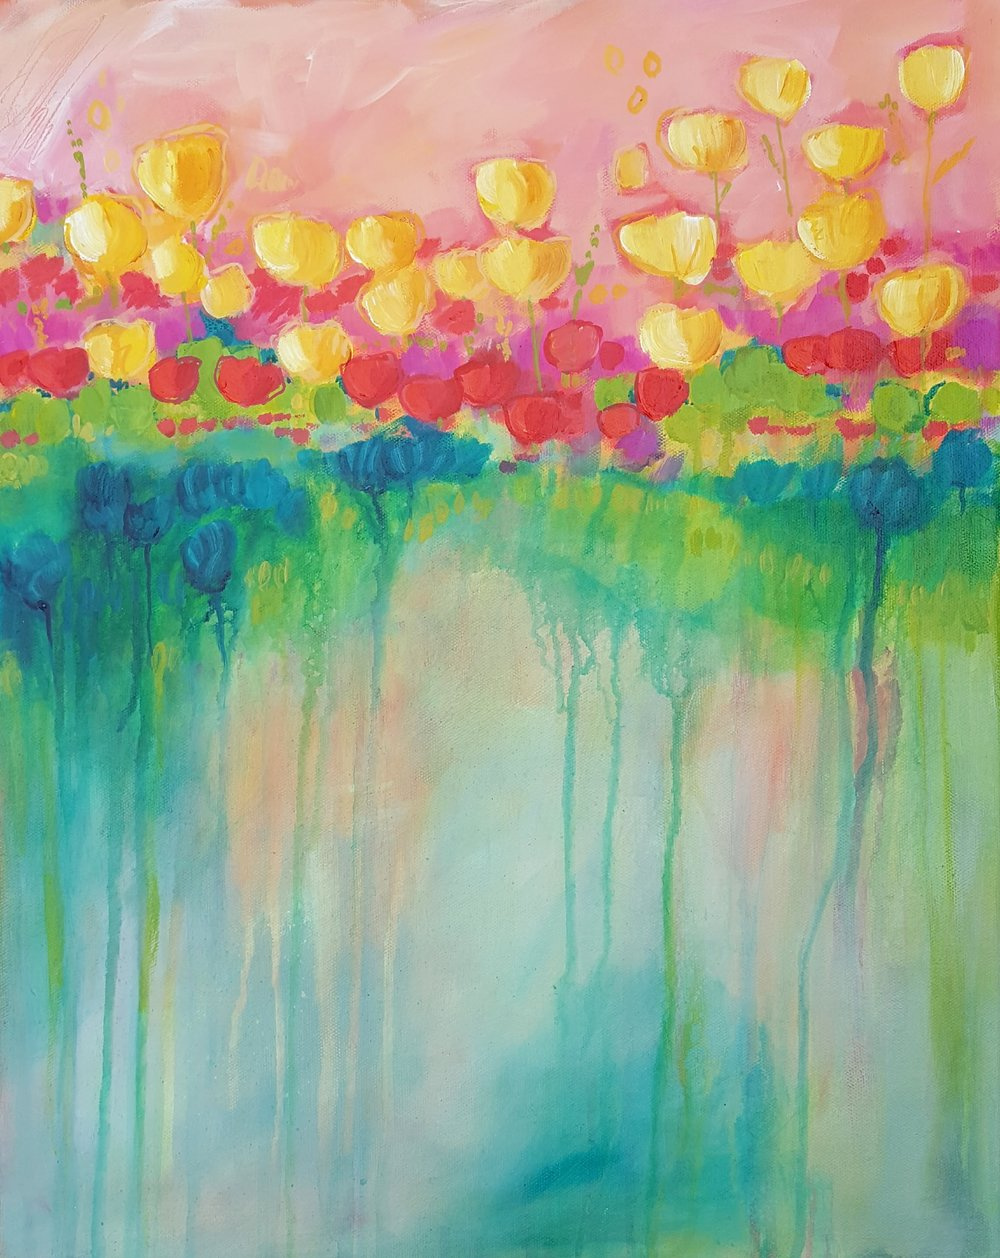 Kellee Wynne Conrad commission abstract floral.jpg